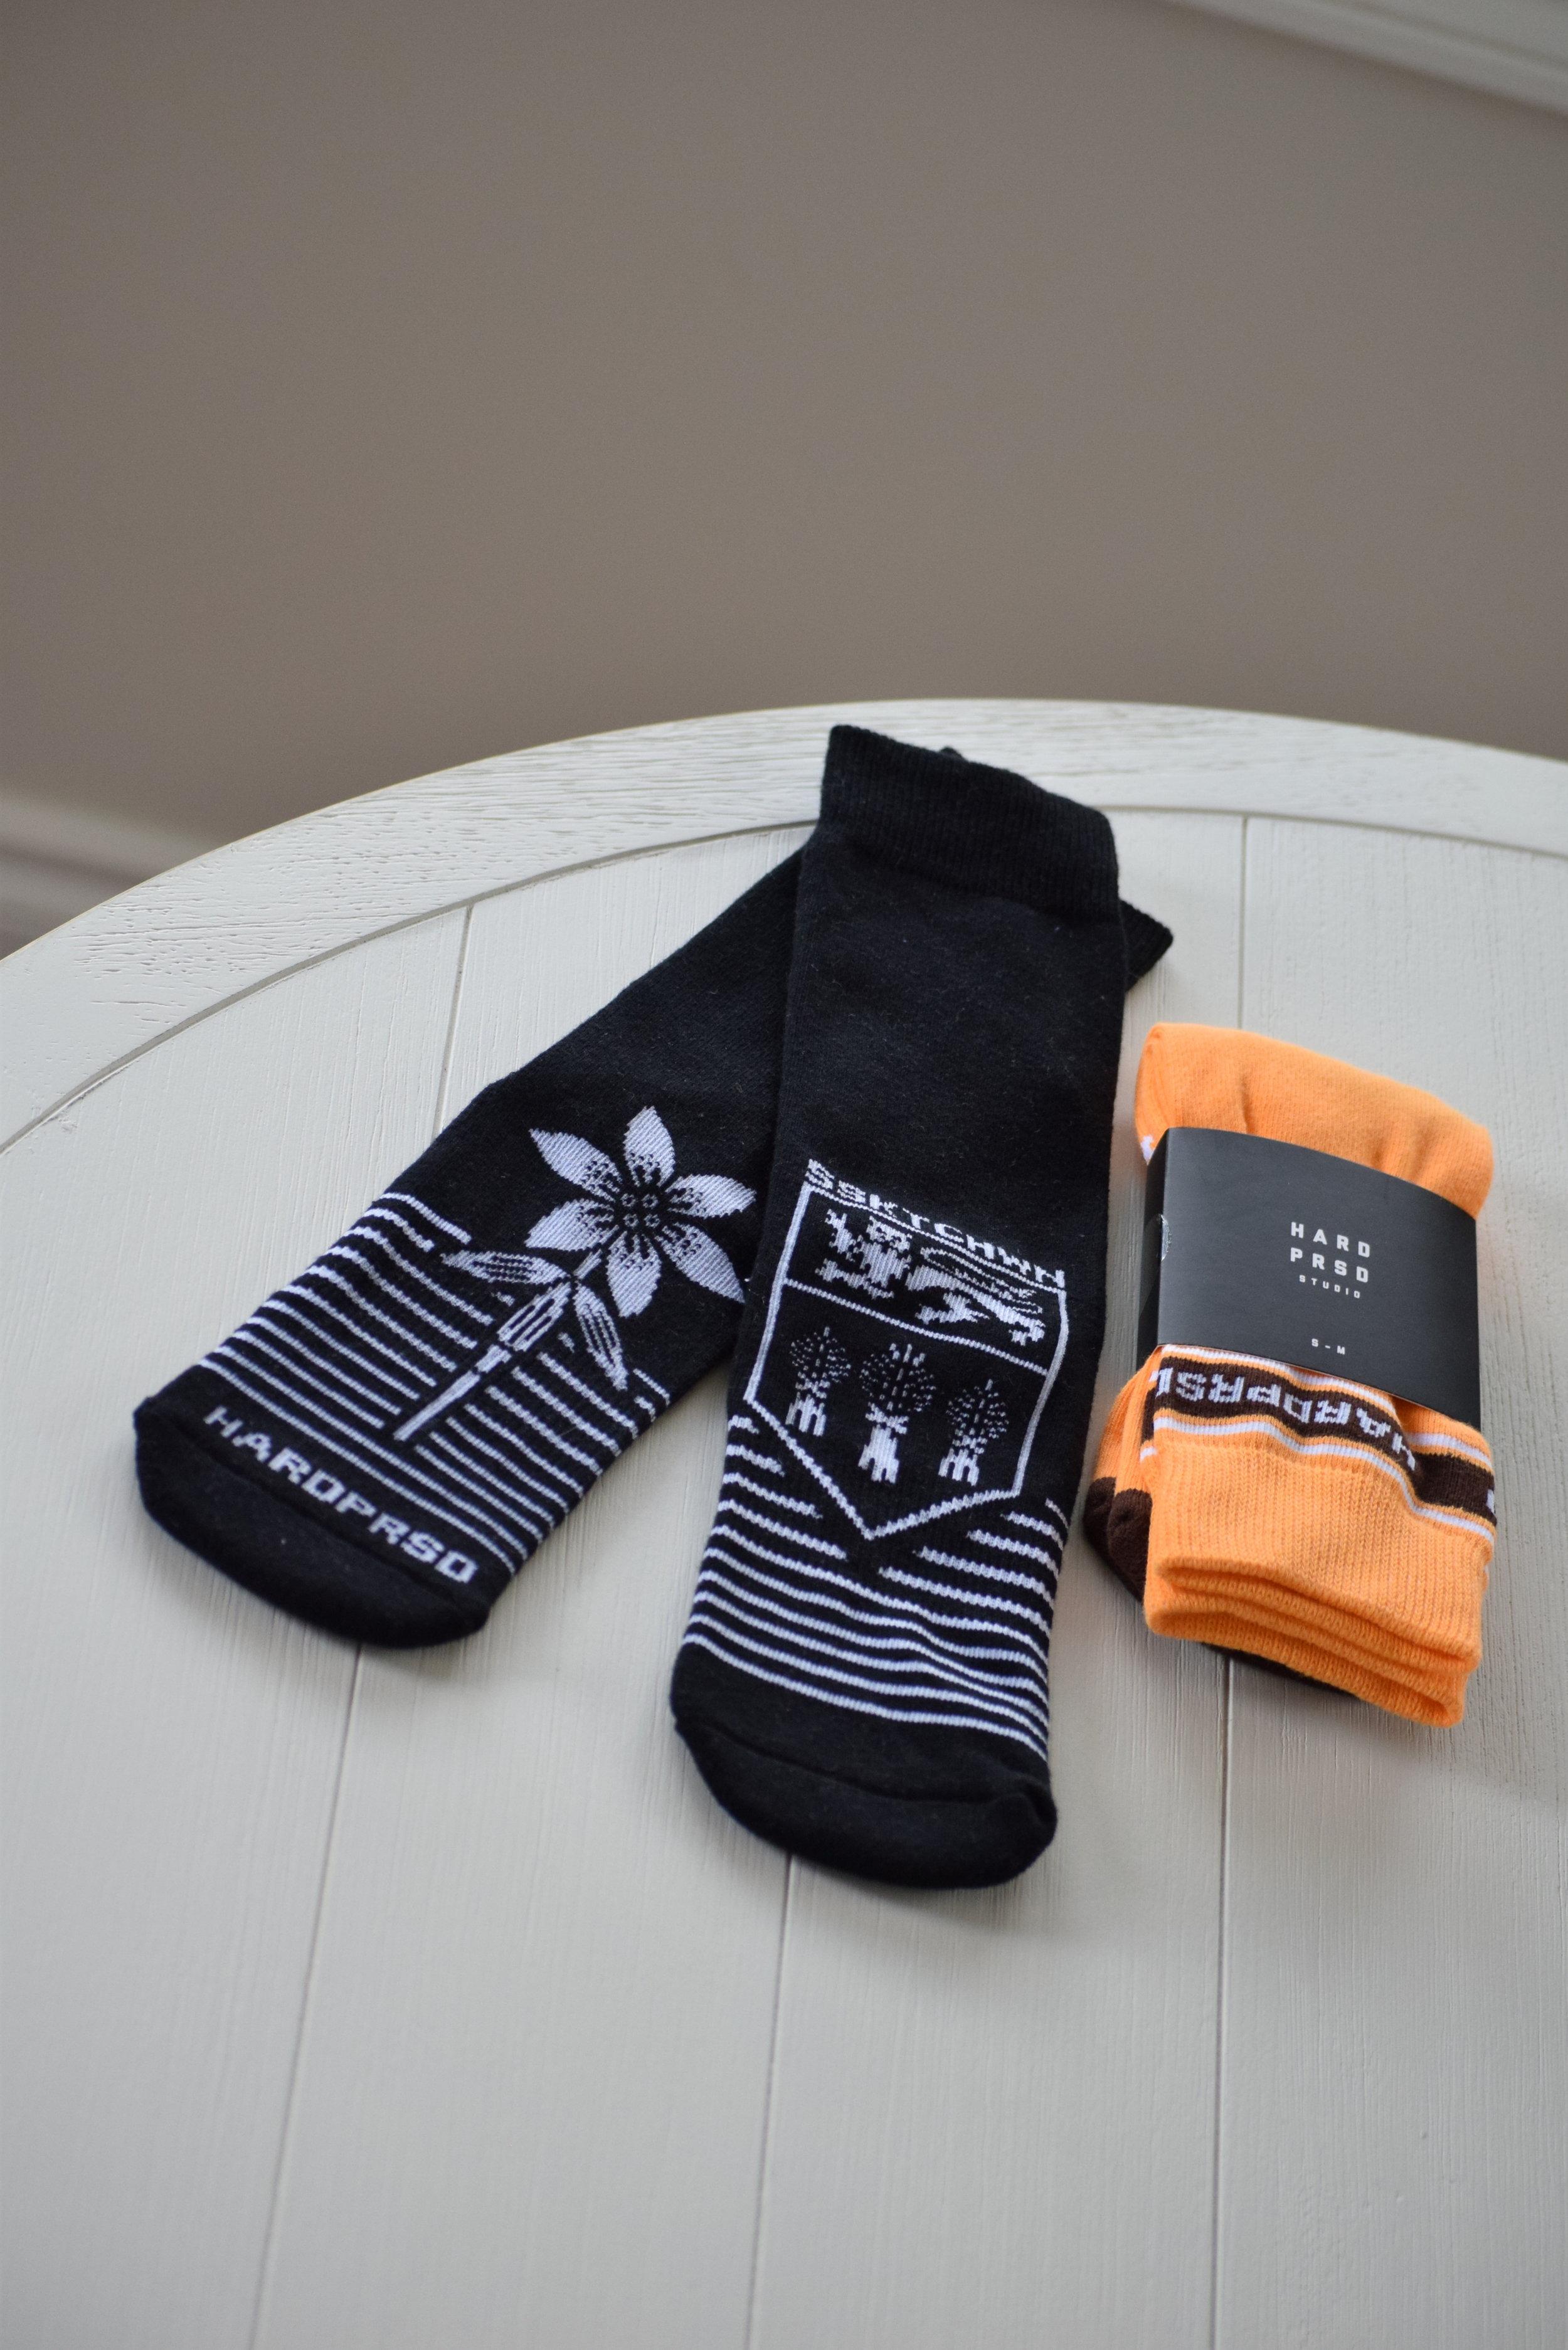 saskatchewan socks hardpressed